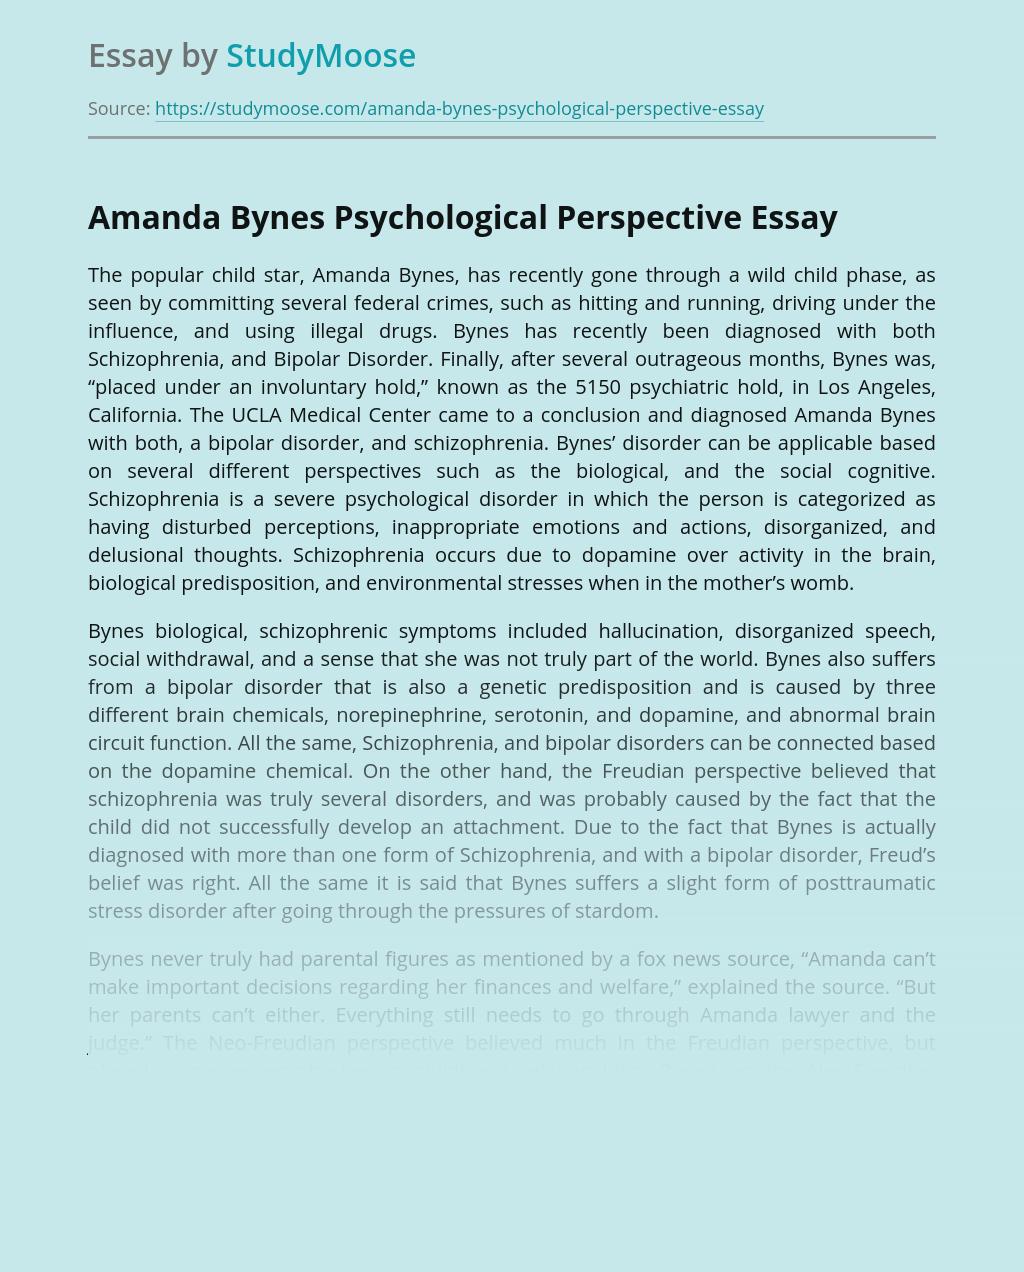 Amanda Bynes Psychological Perspective